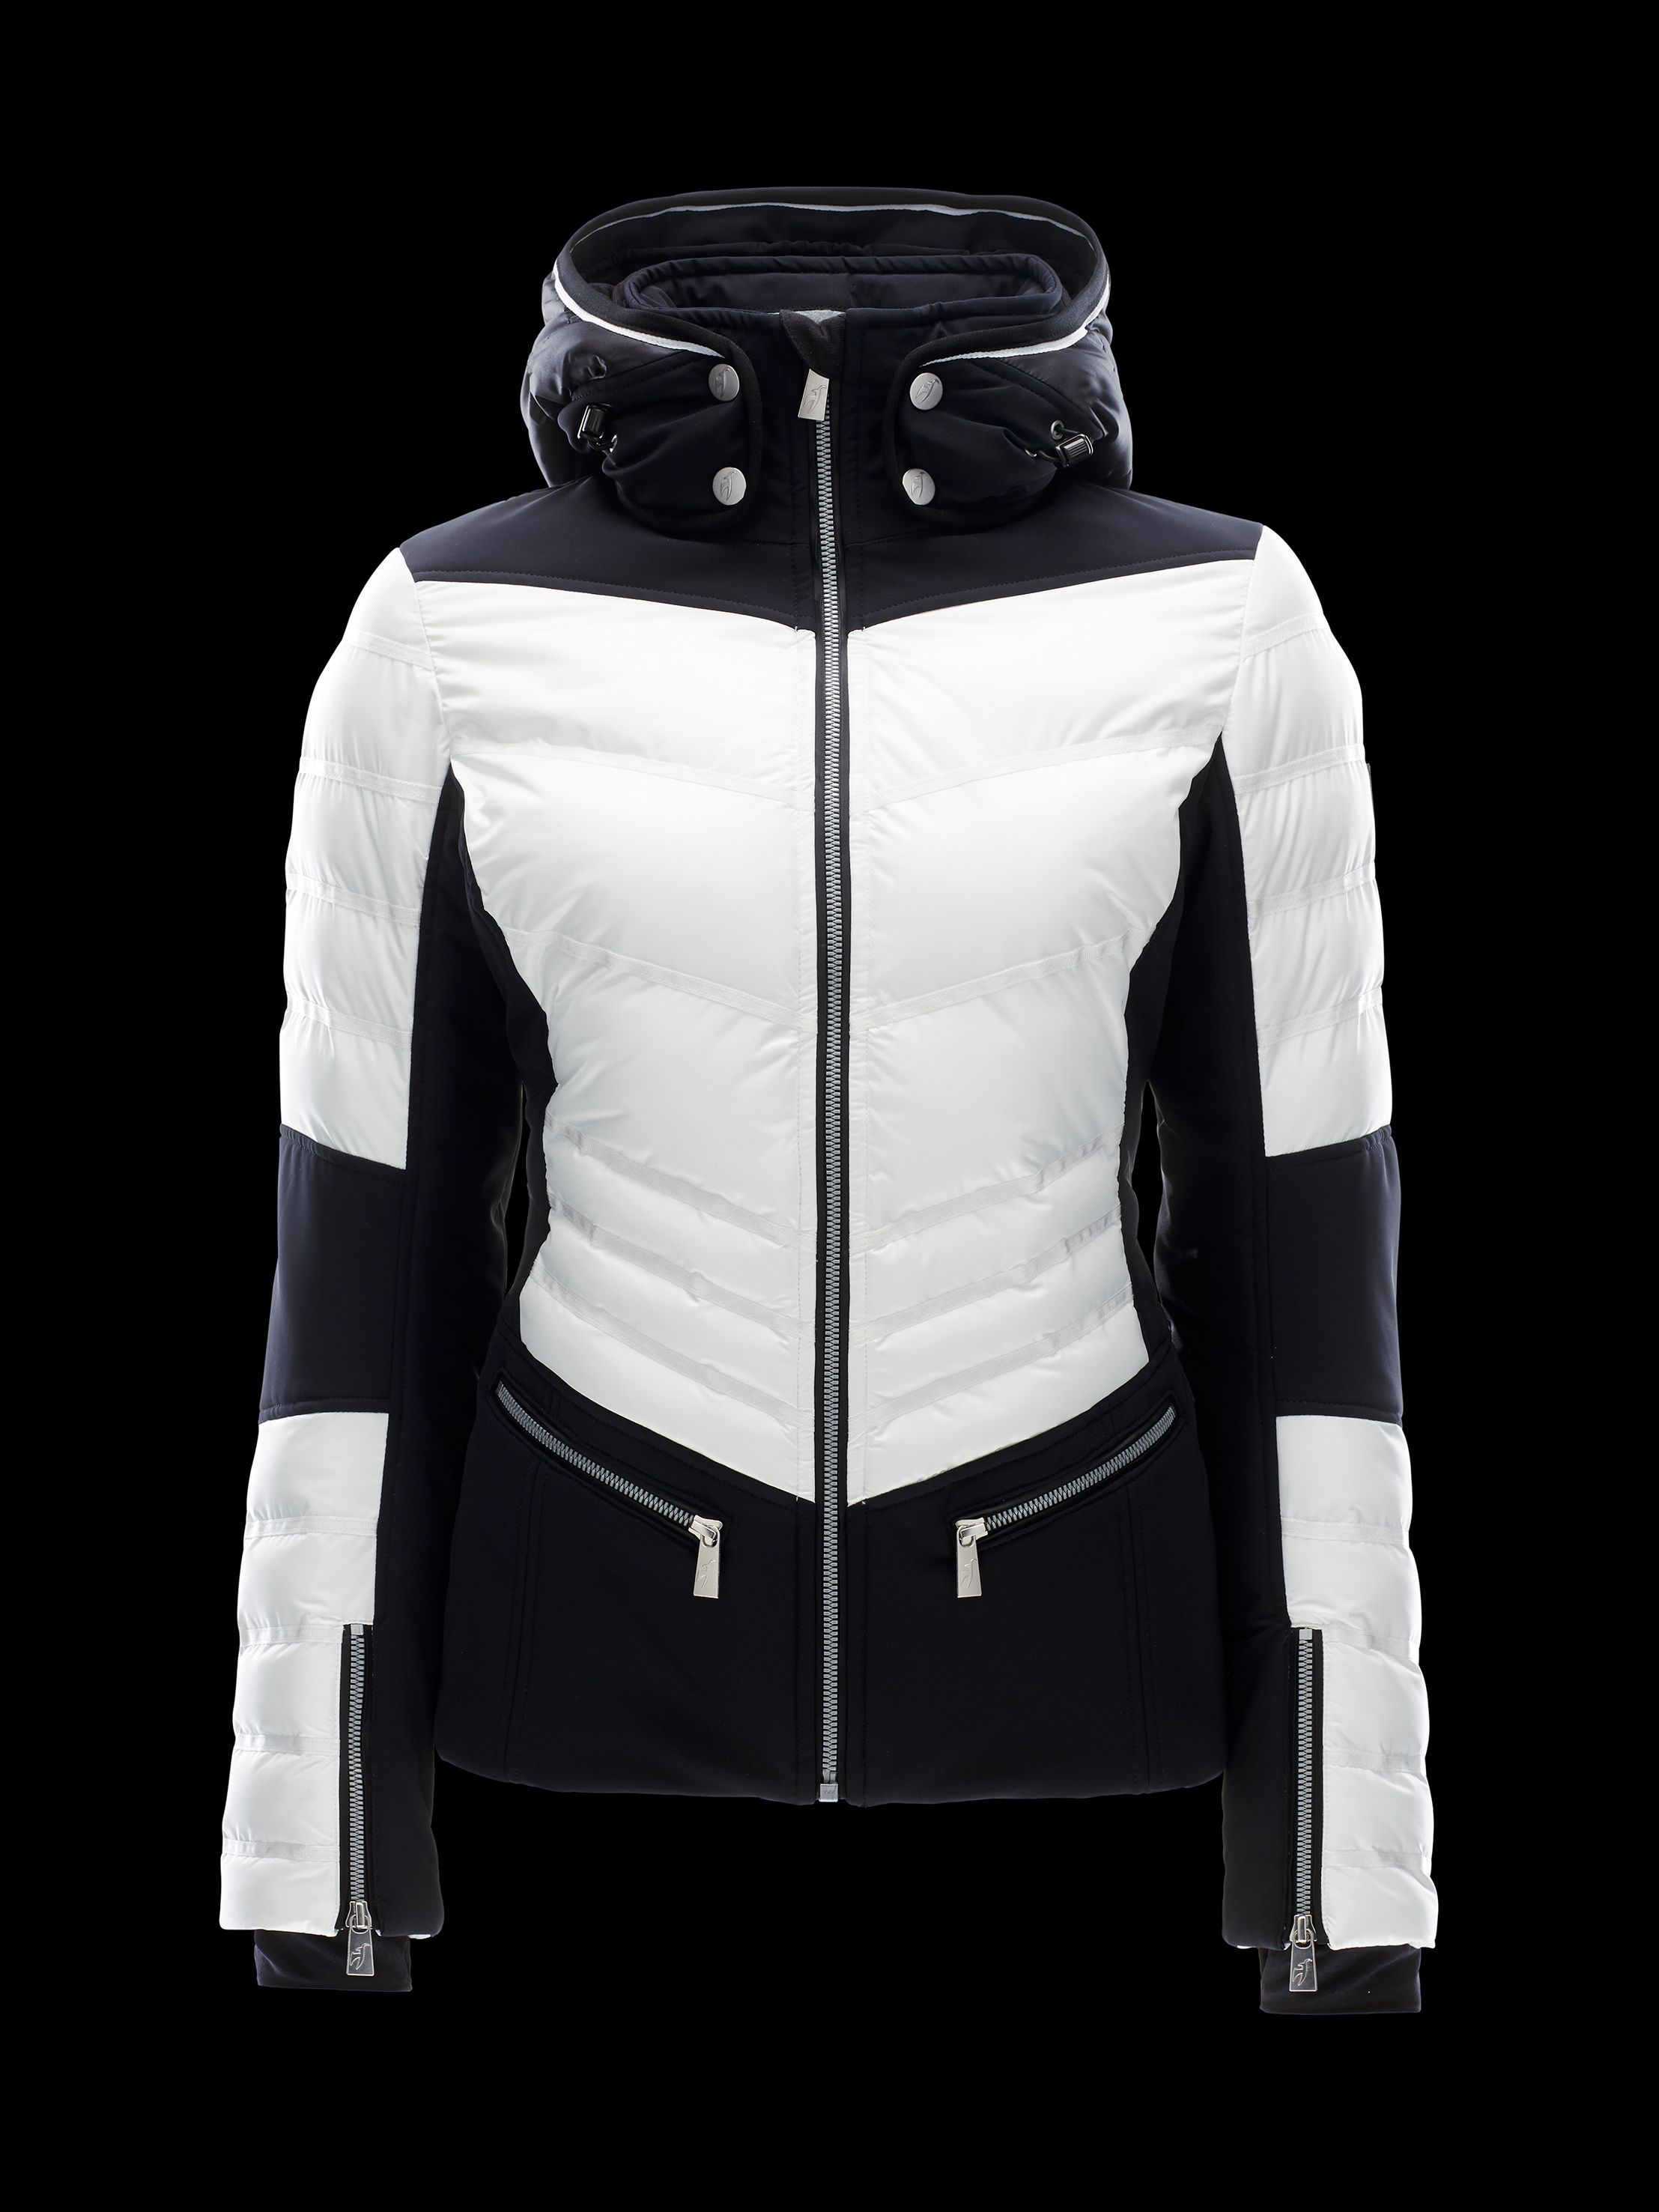 Toni Sailer Ginger Women S Ski Jacket Ski Women Skiing Outfit Ski Jacket